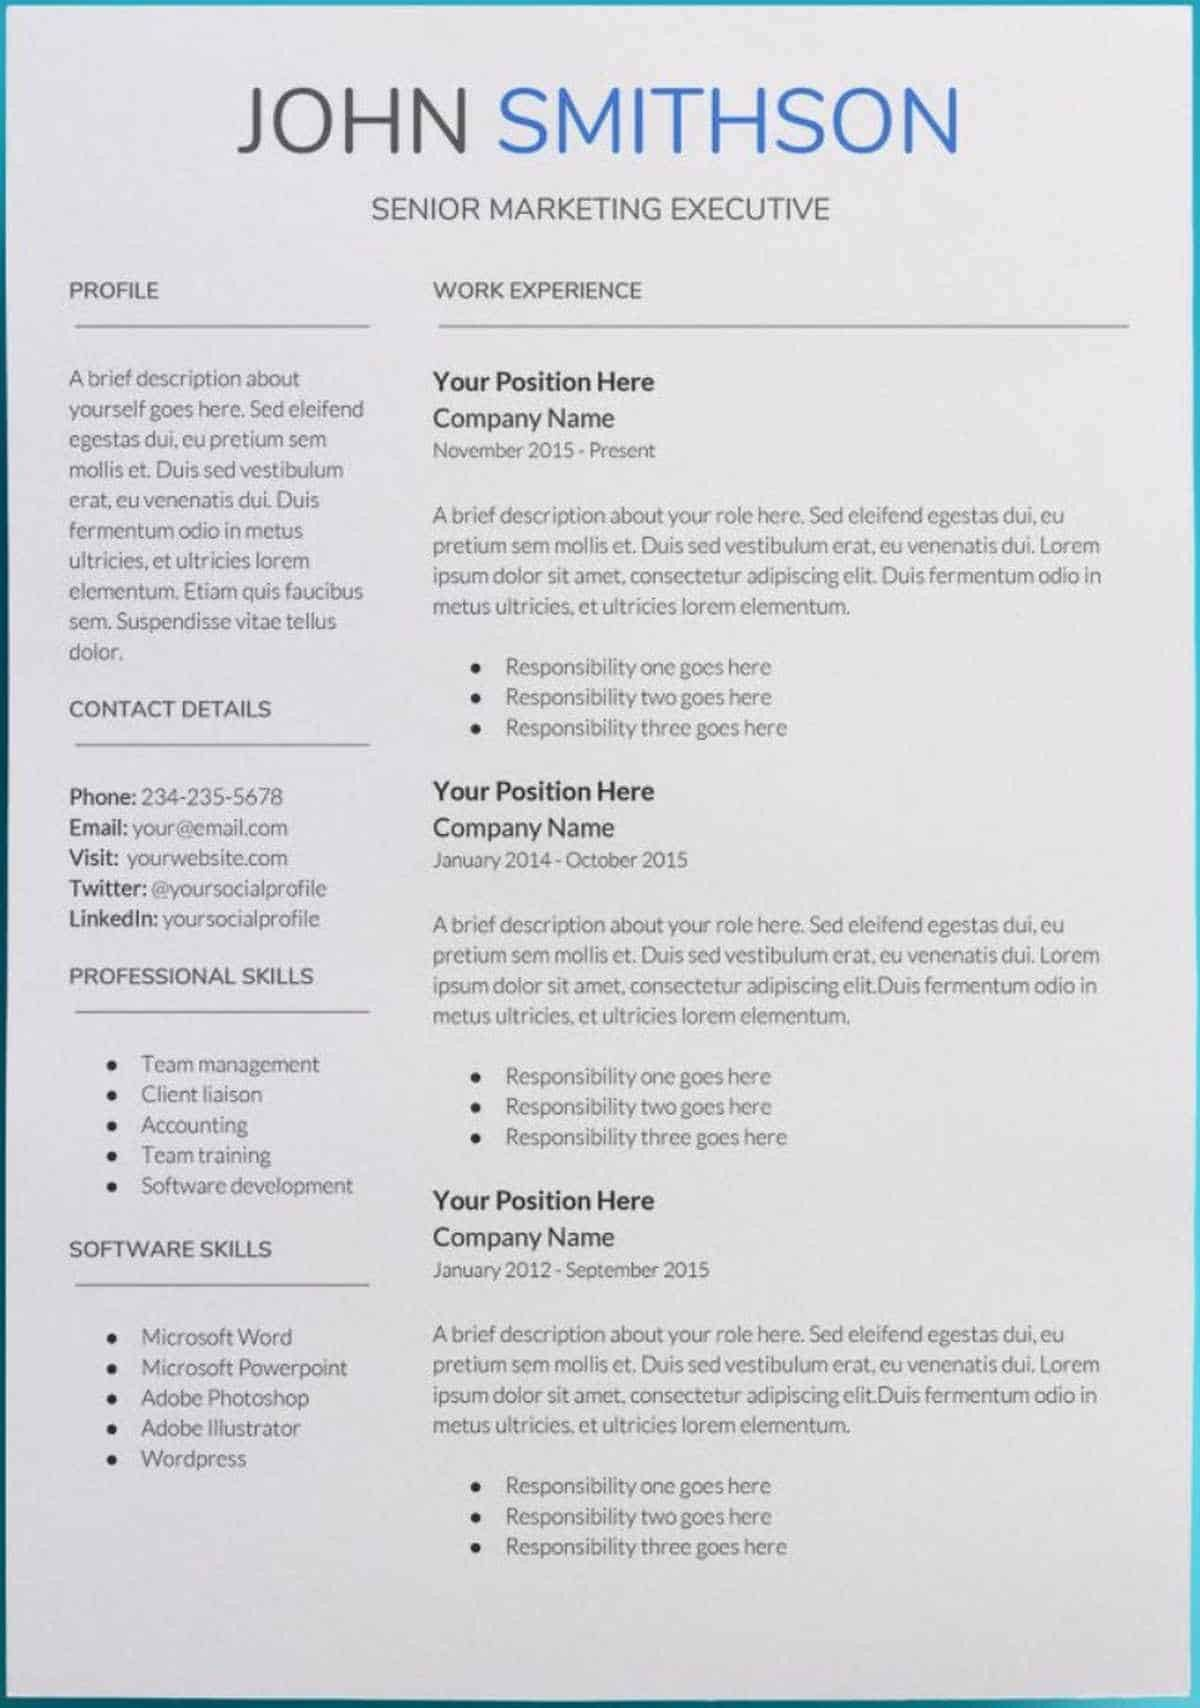 50++ Google resume templates free download Format